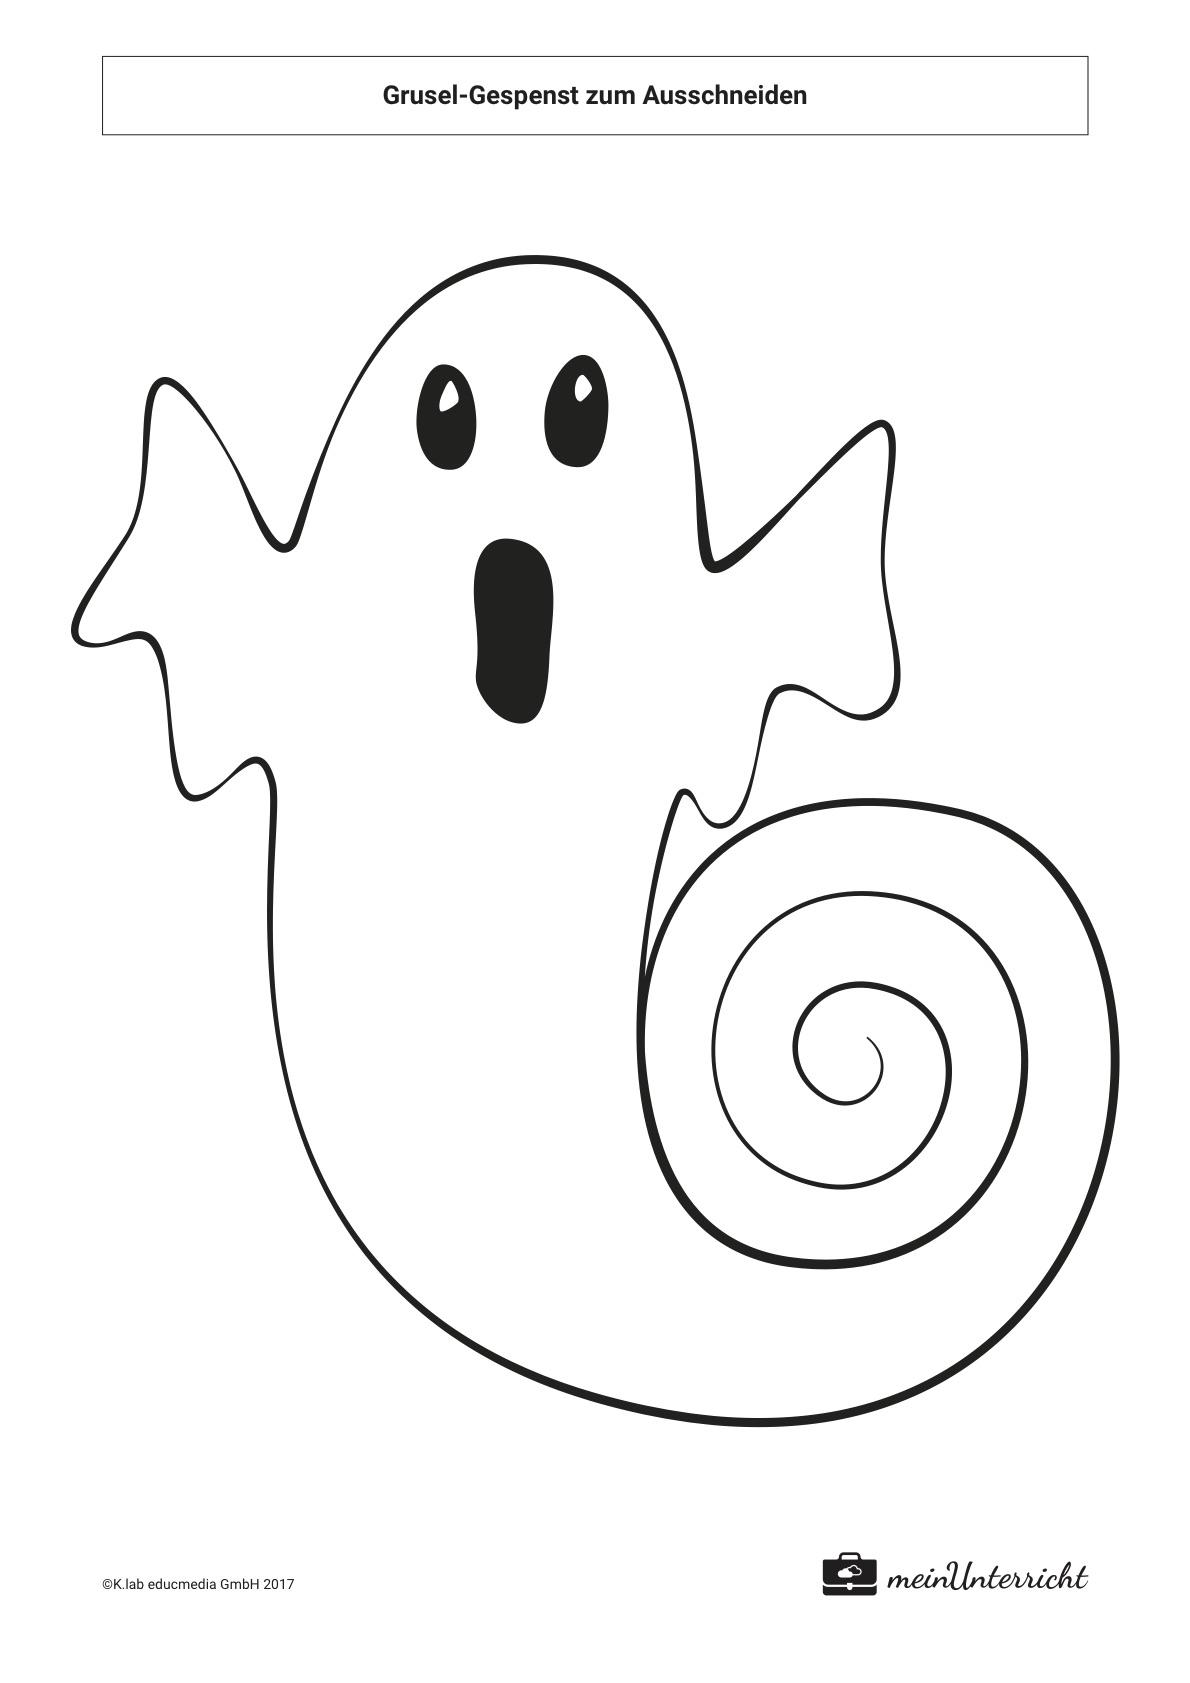 Halloween Grusel Gespenst Basteln Meinunterrichtde